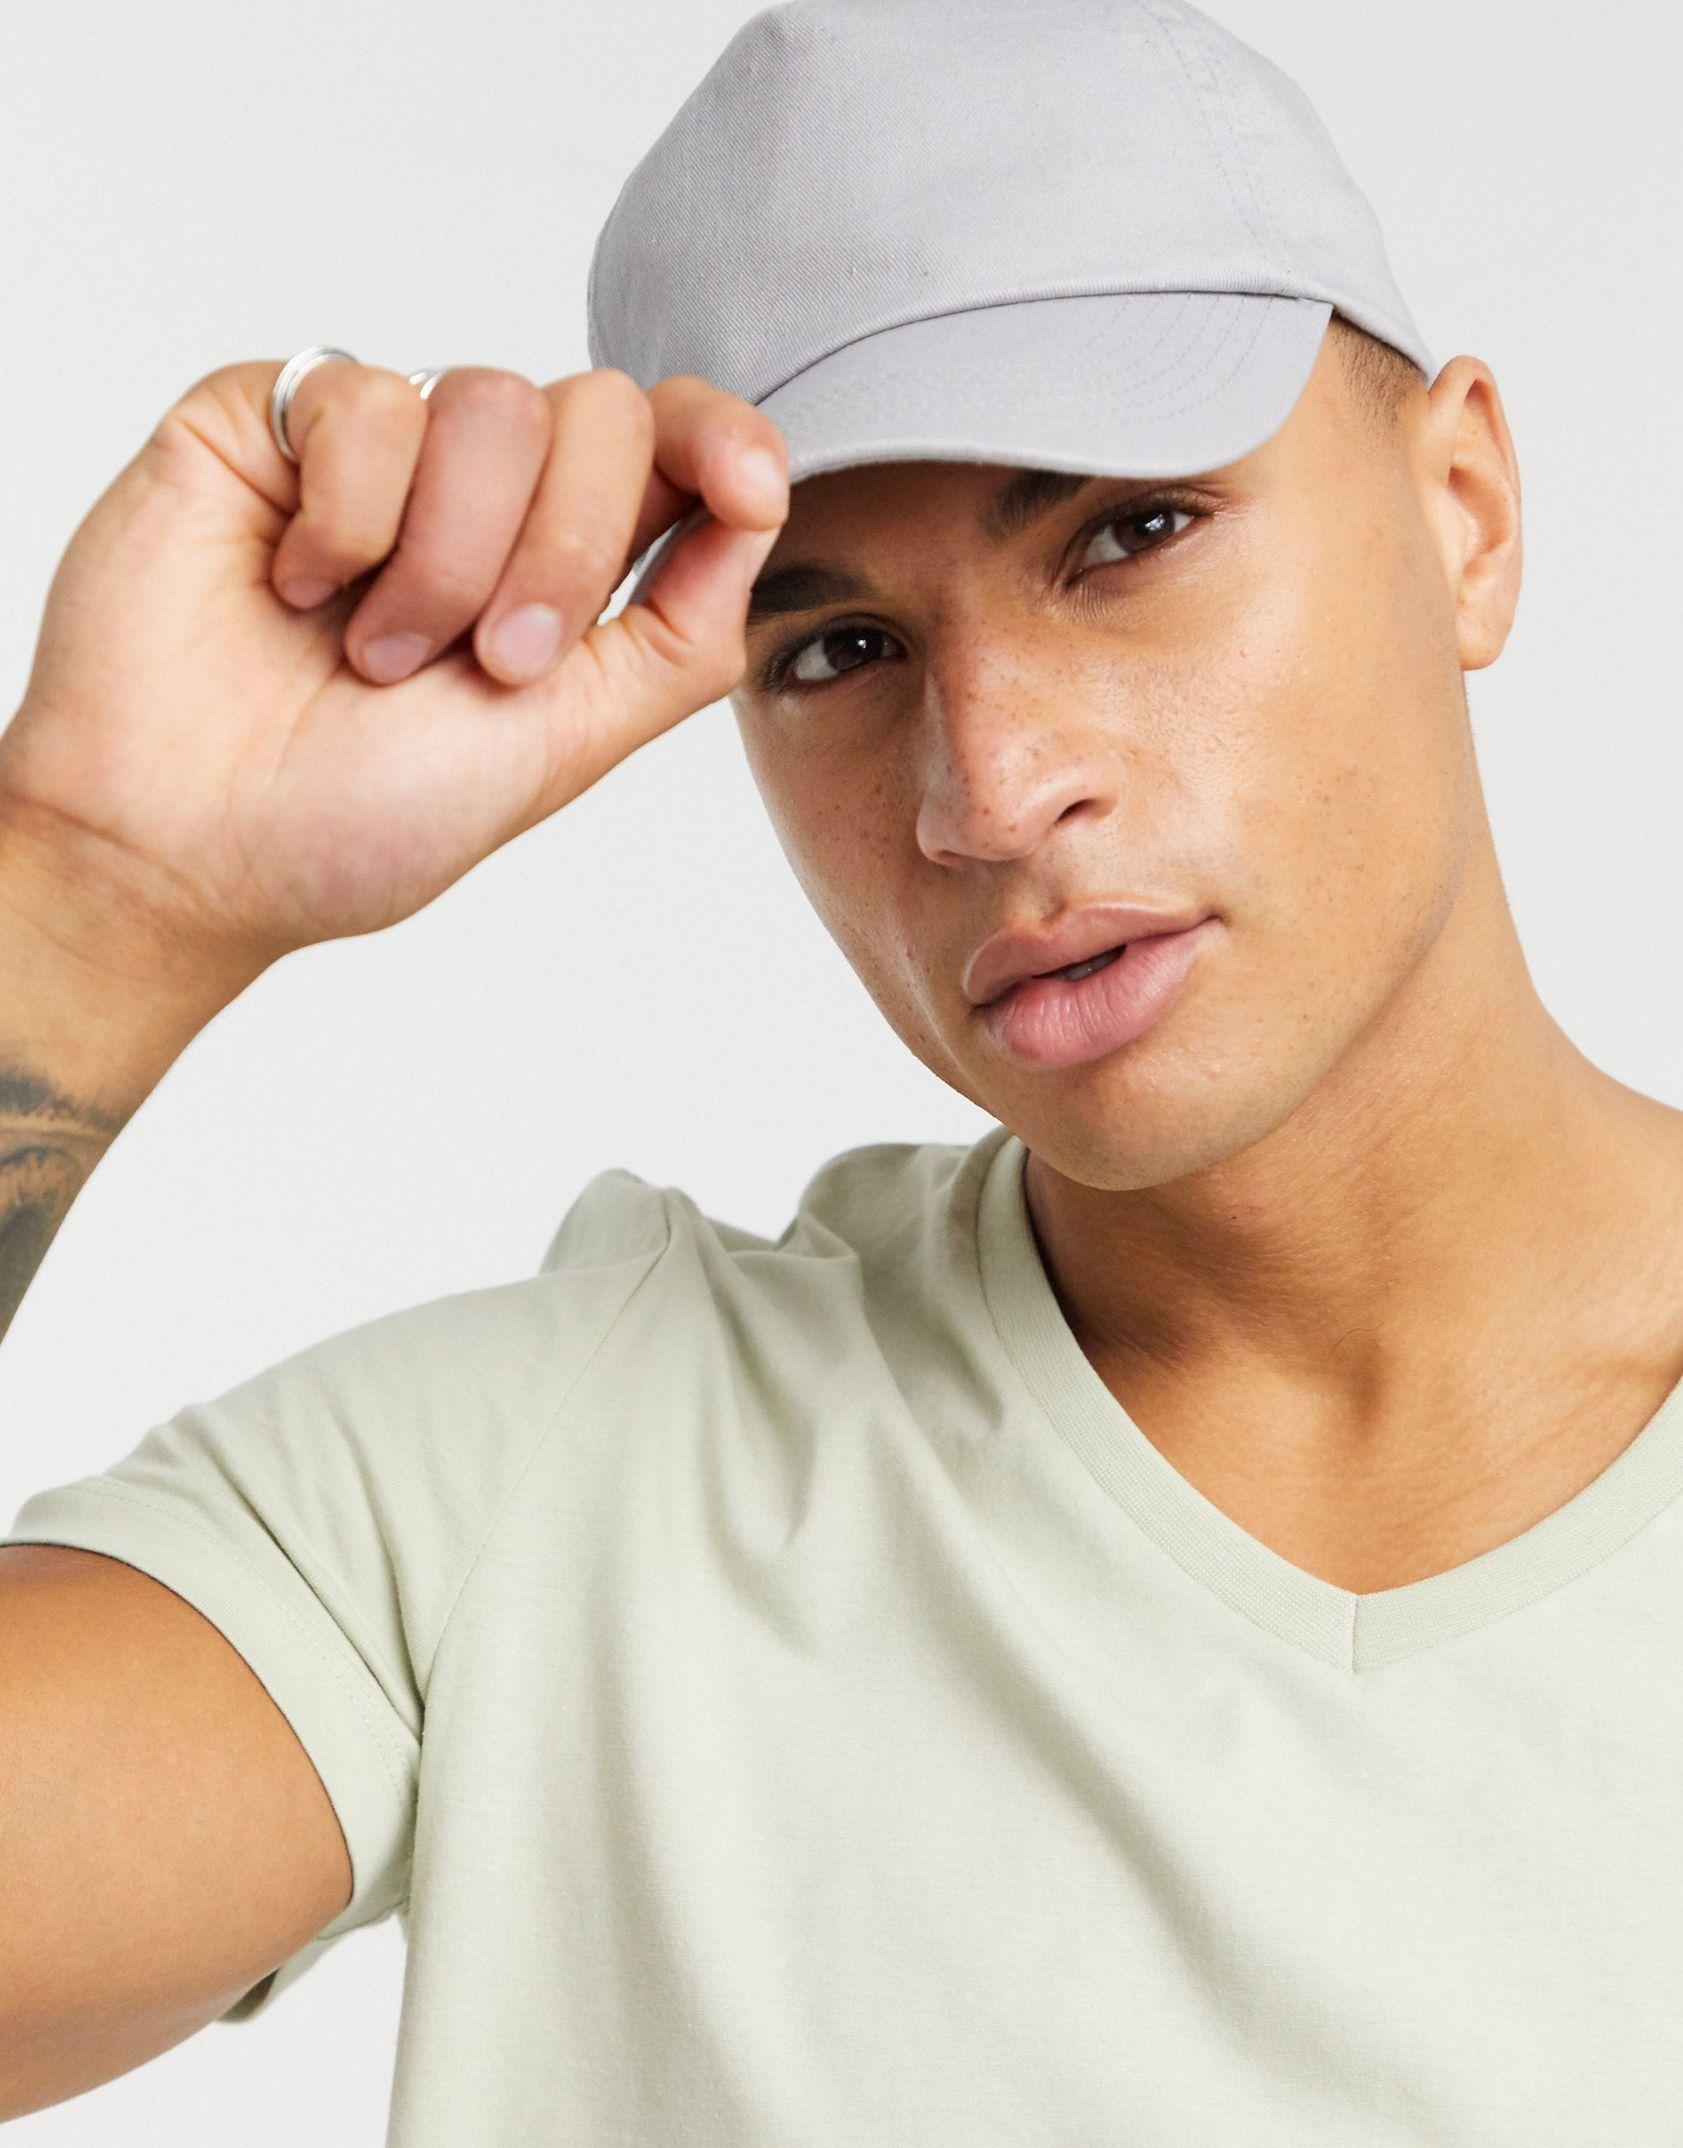 ASOS DESIGN t-shirt with v neck in beige - ASOS Price Checker